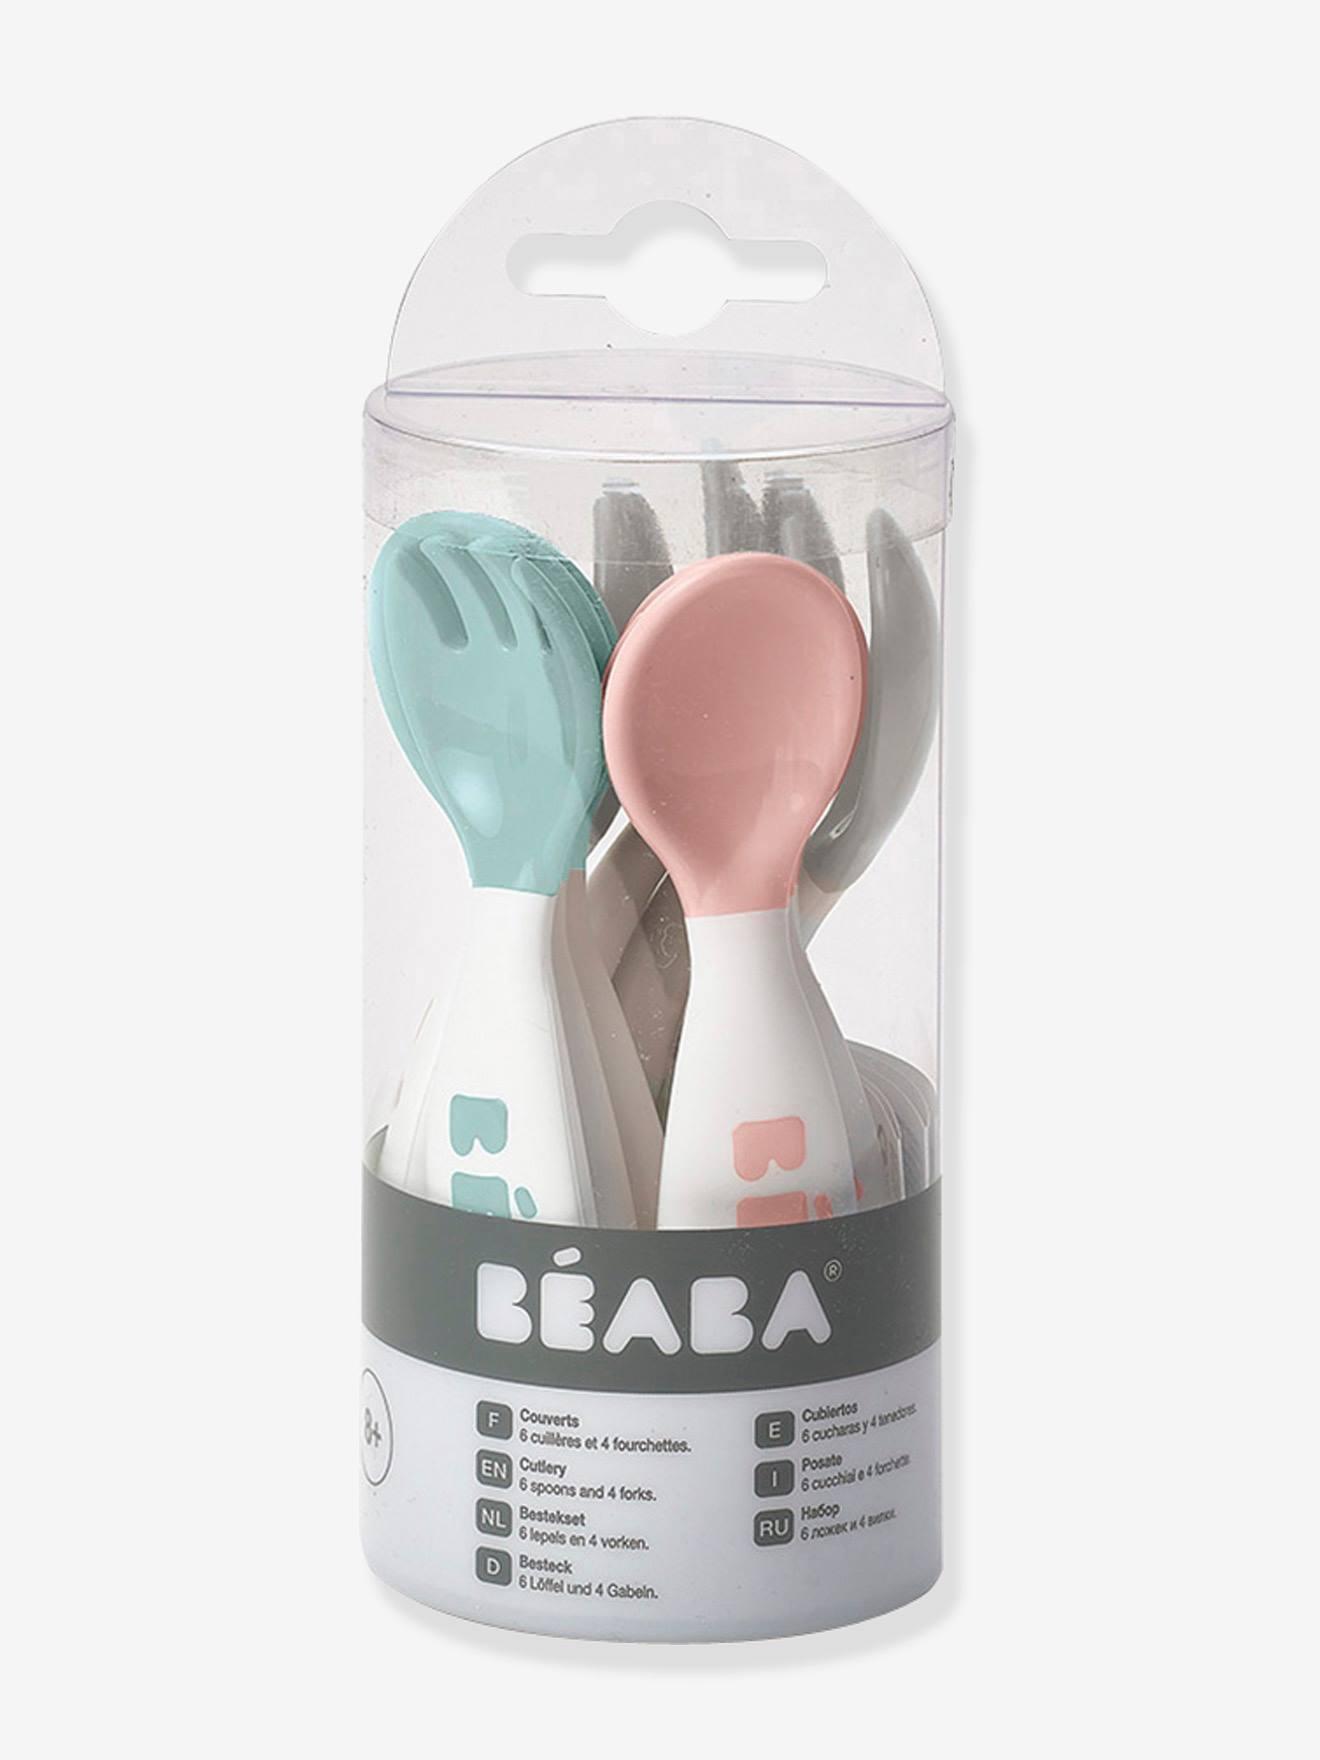 Lot de 10 couverts ergonomiques 2e âge BEABA old pink/ airy green/ light mi